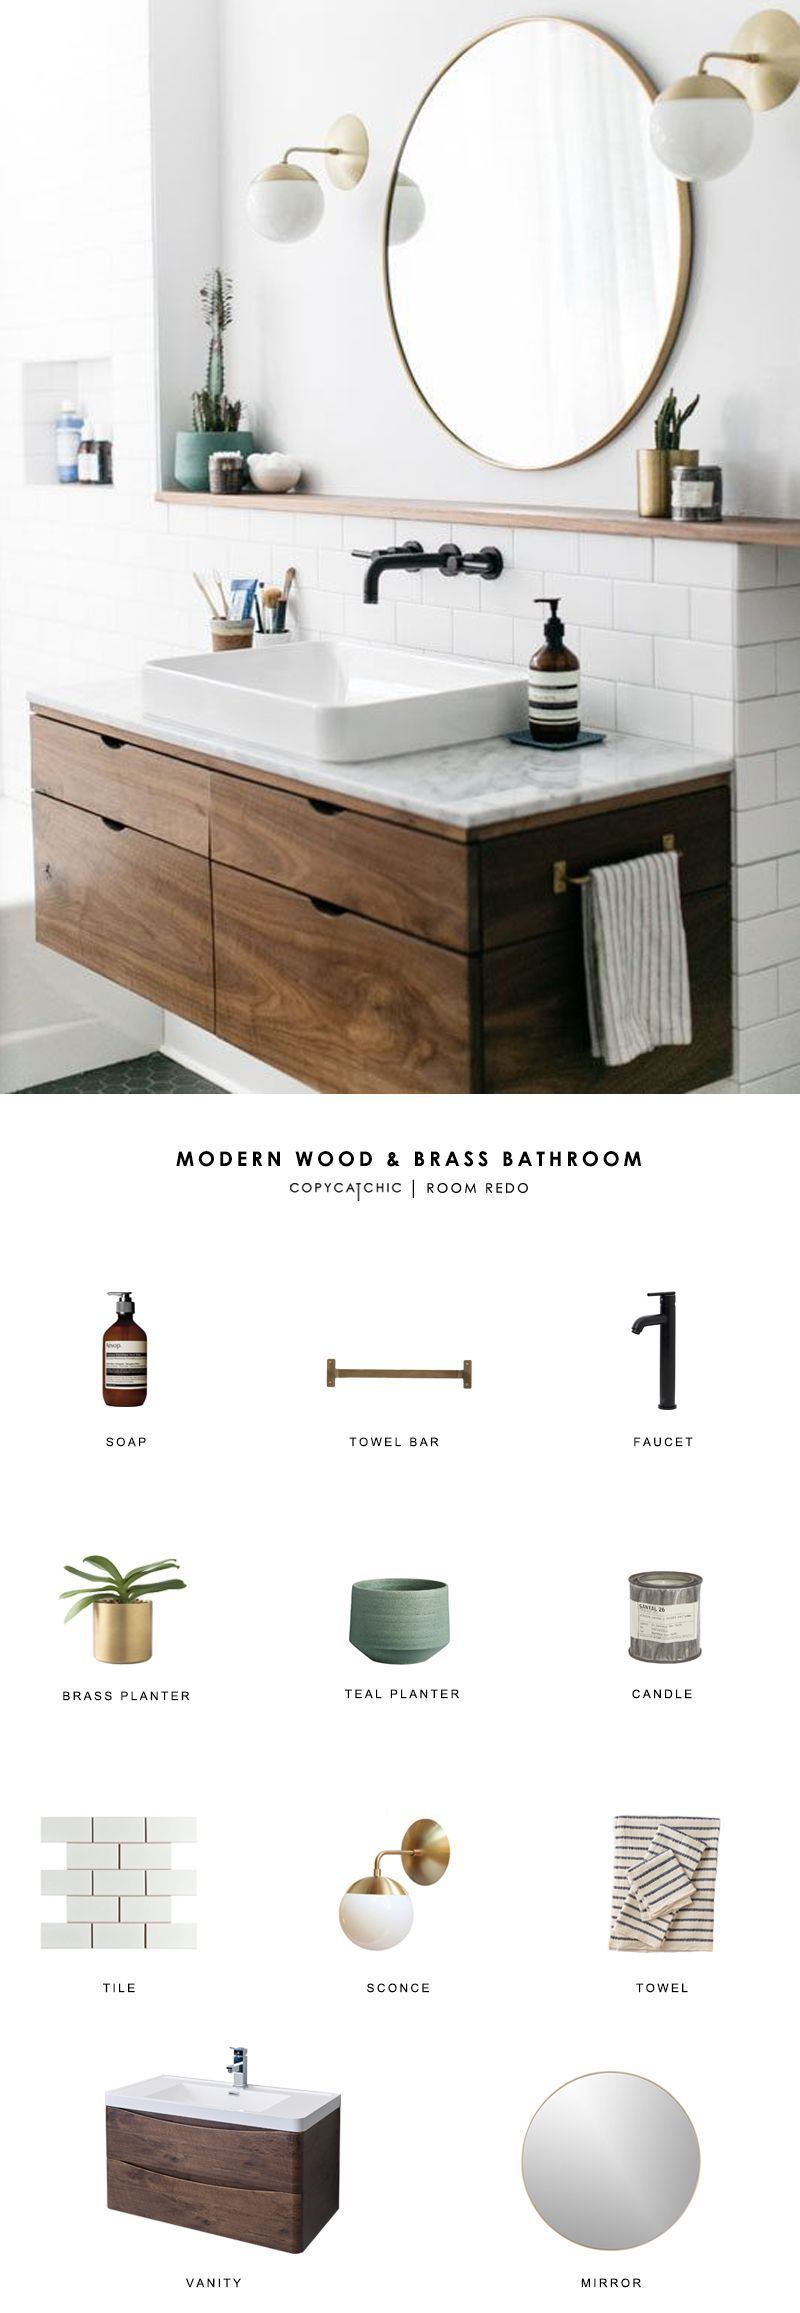 Photo of Top 5 modern bathroom design by 2018